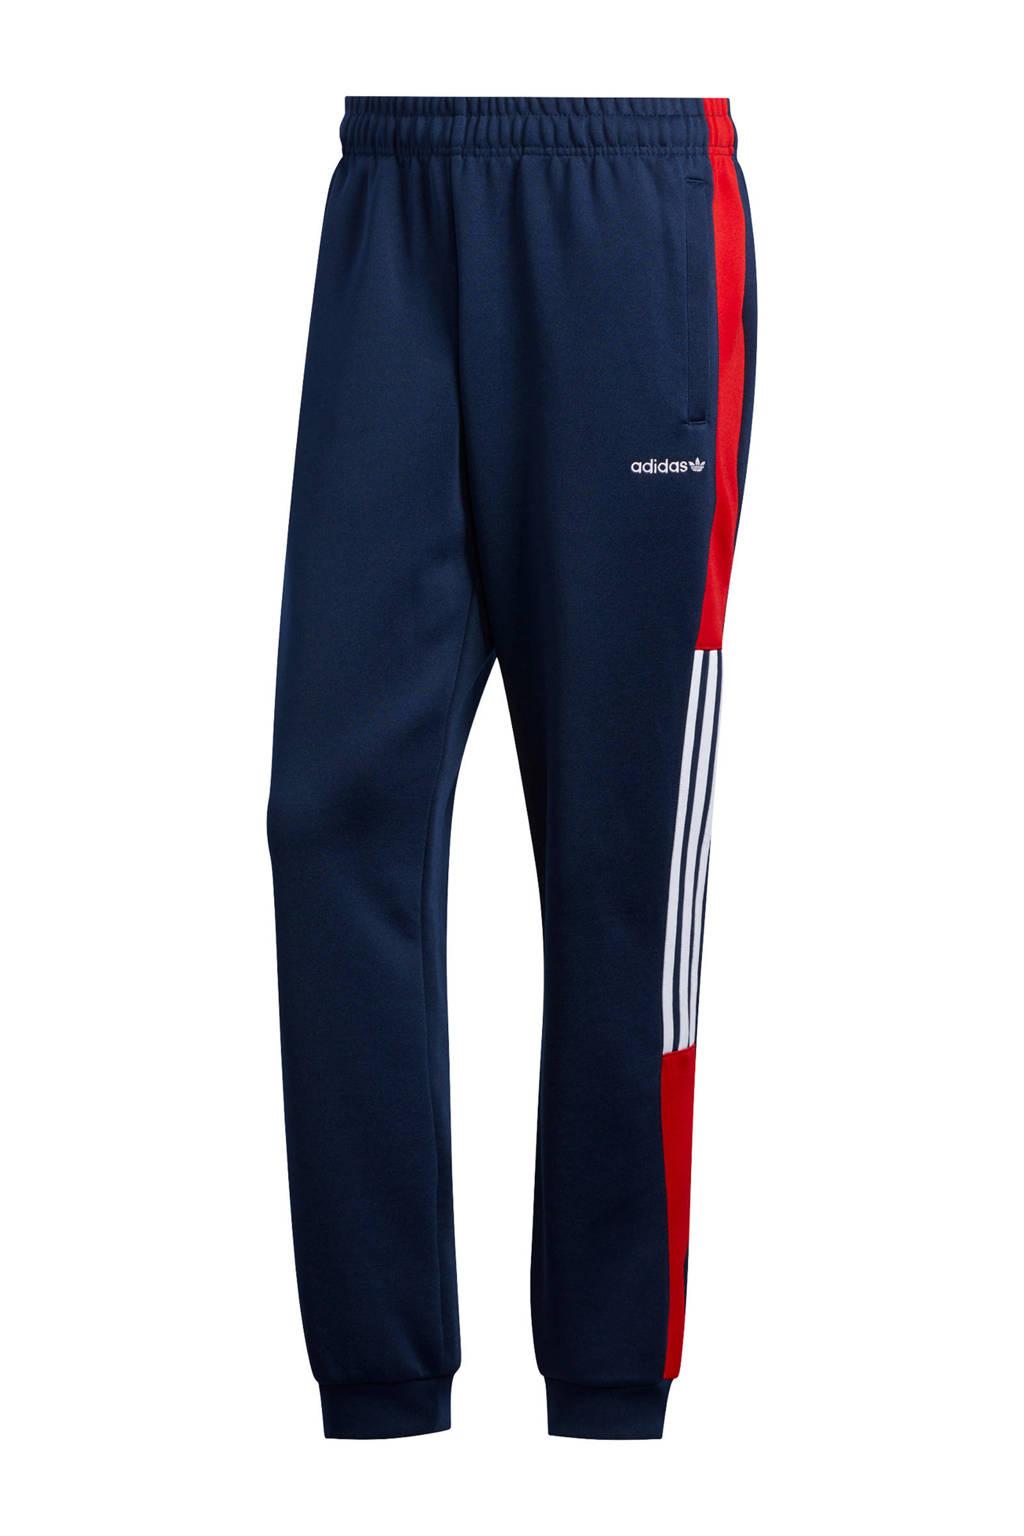 adidas Originals trainingsbroek donkerblauw/rood, Donkerblauw/rood